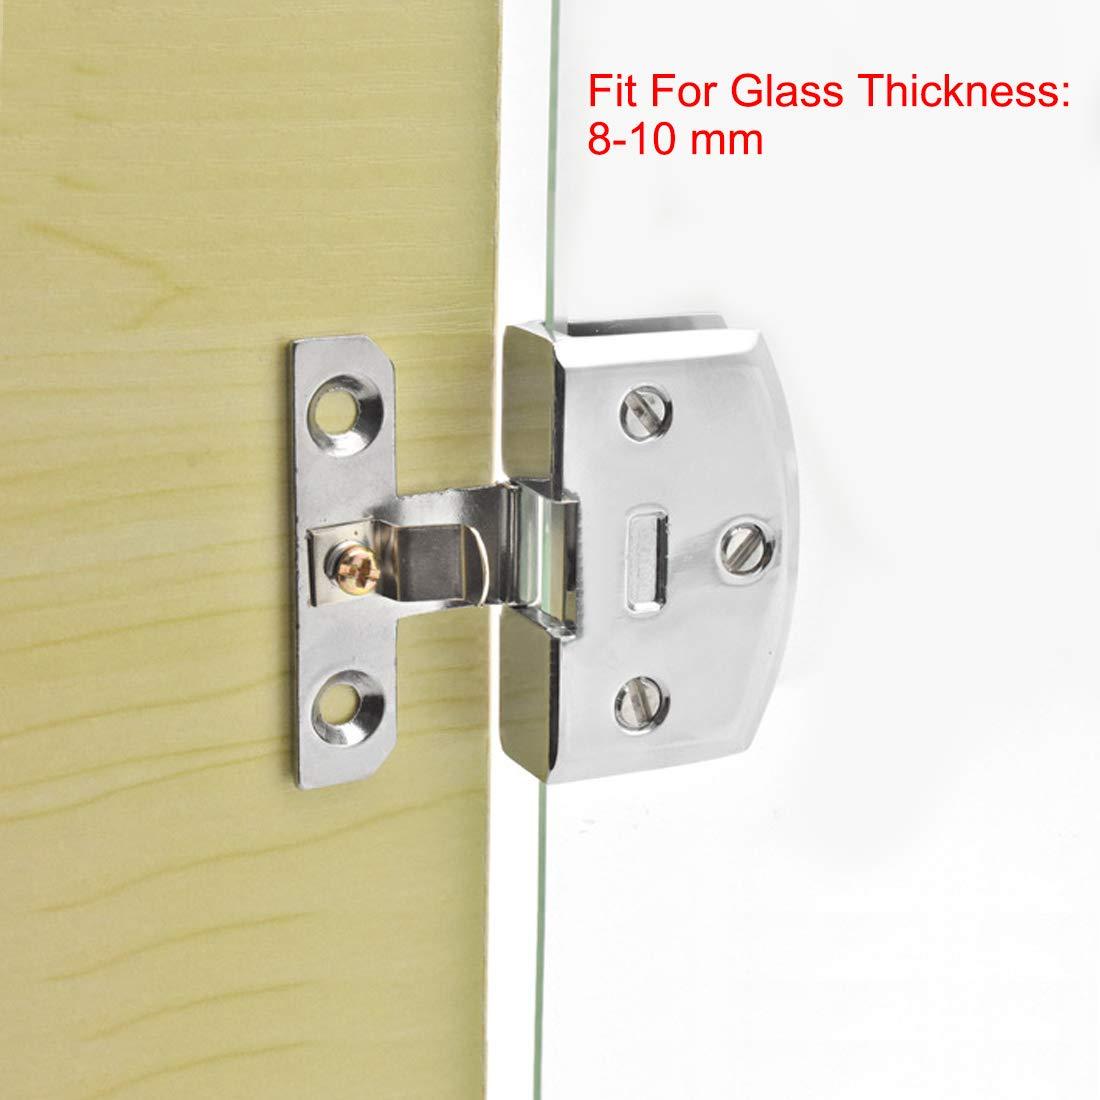 for 8-10mm Glass Thickness uxcell Glass Door Hinge Cupboard Showcase Cabinet Door Hinge Glass Clamp,Zinc Alloy